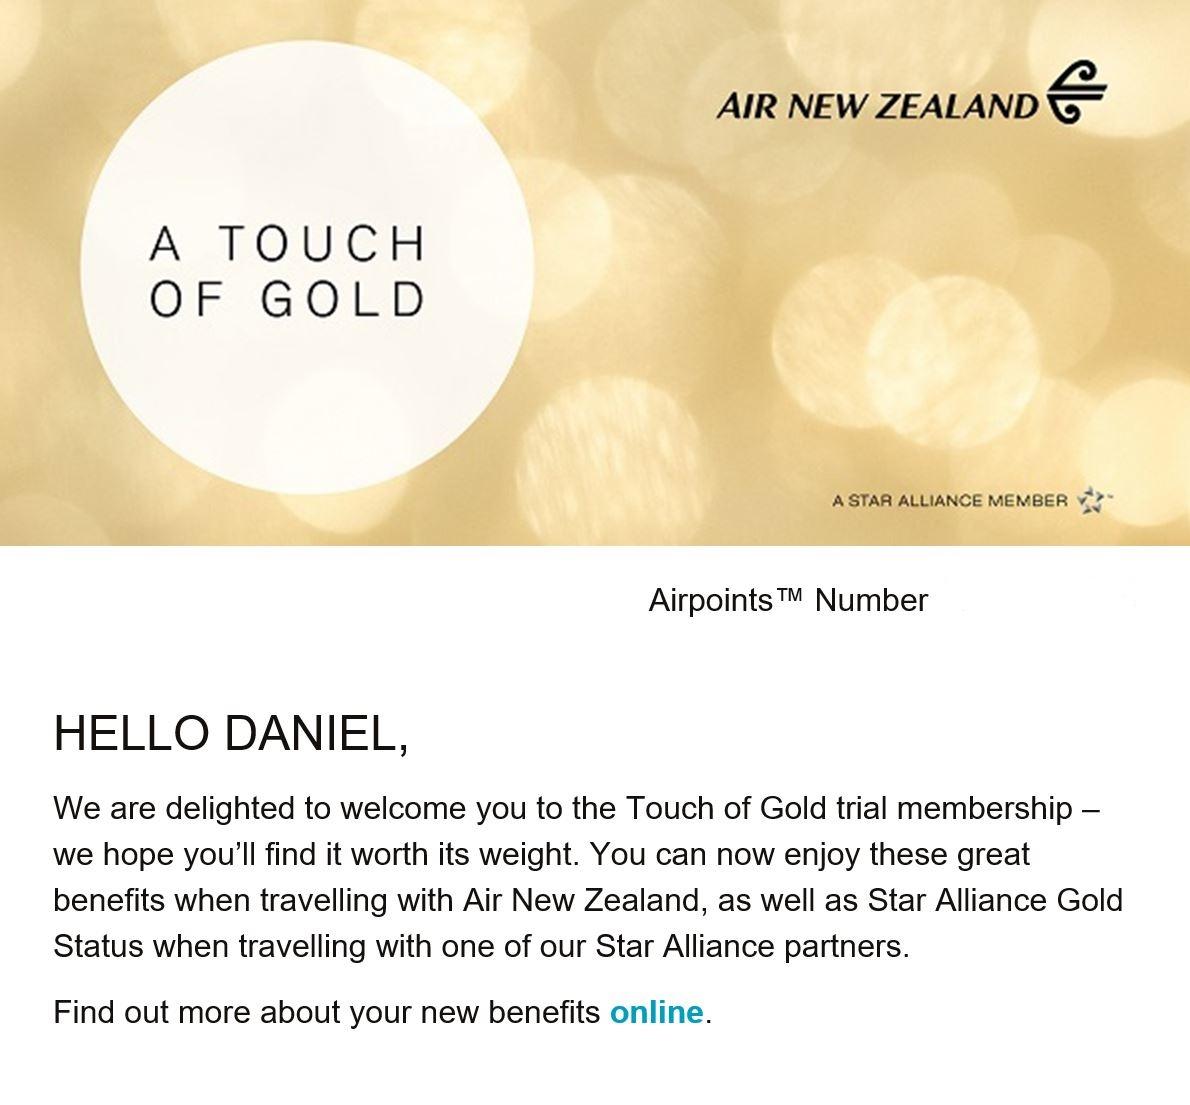 Air New Zealand Match Success Email